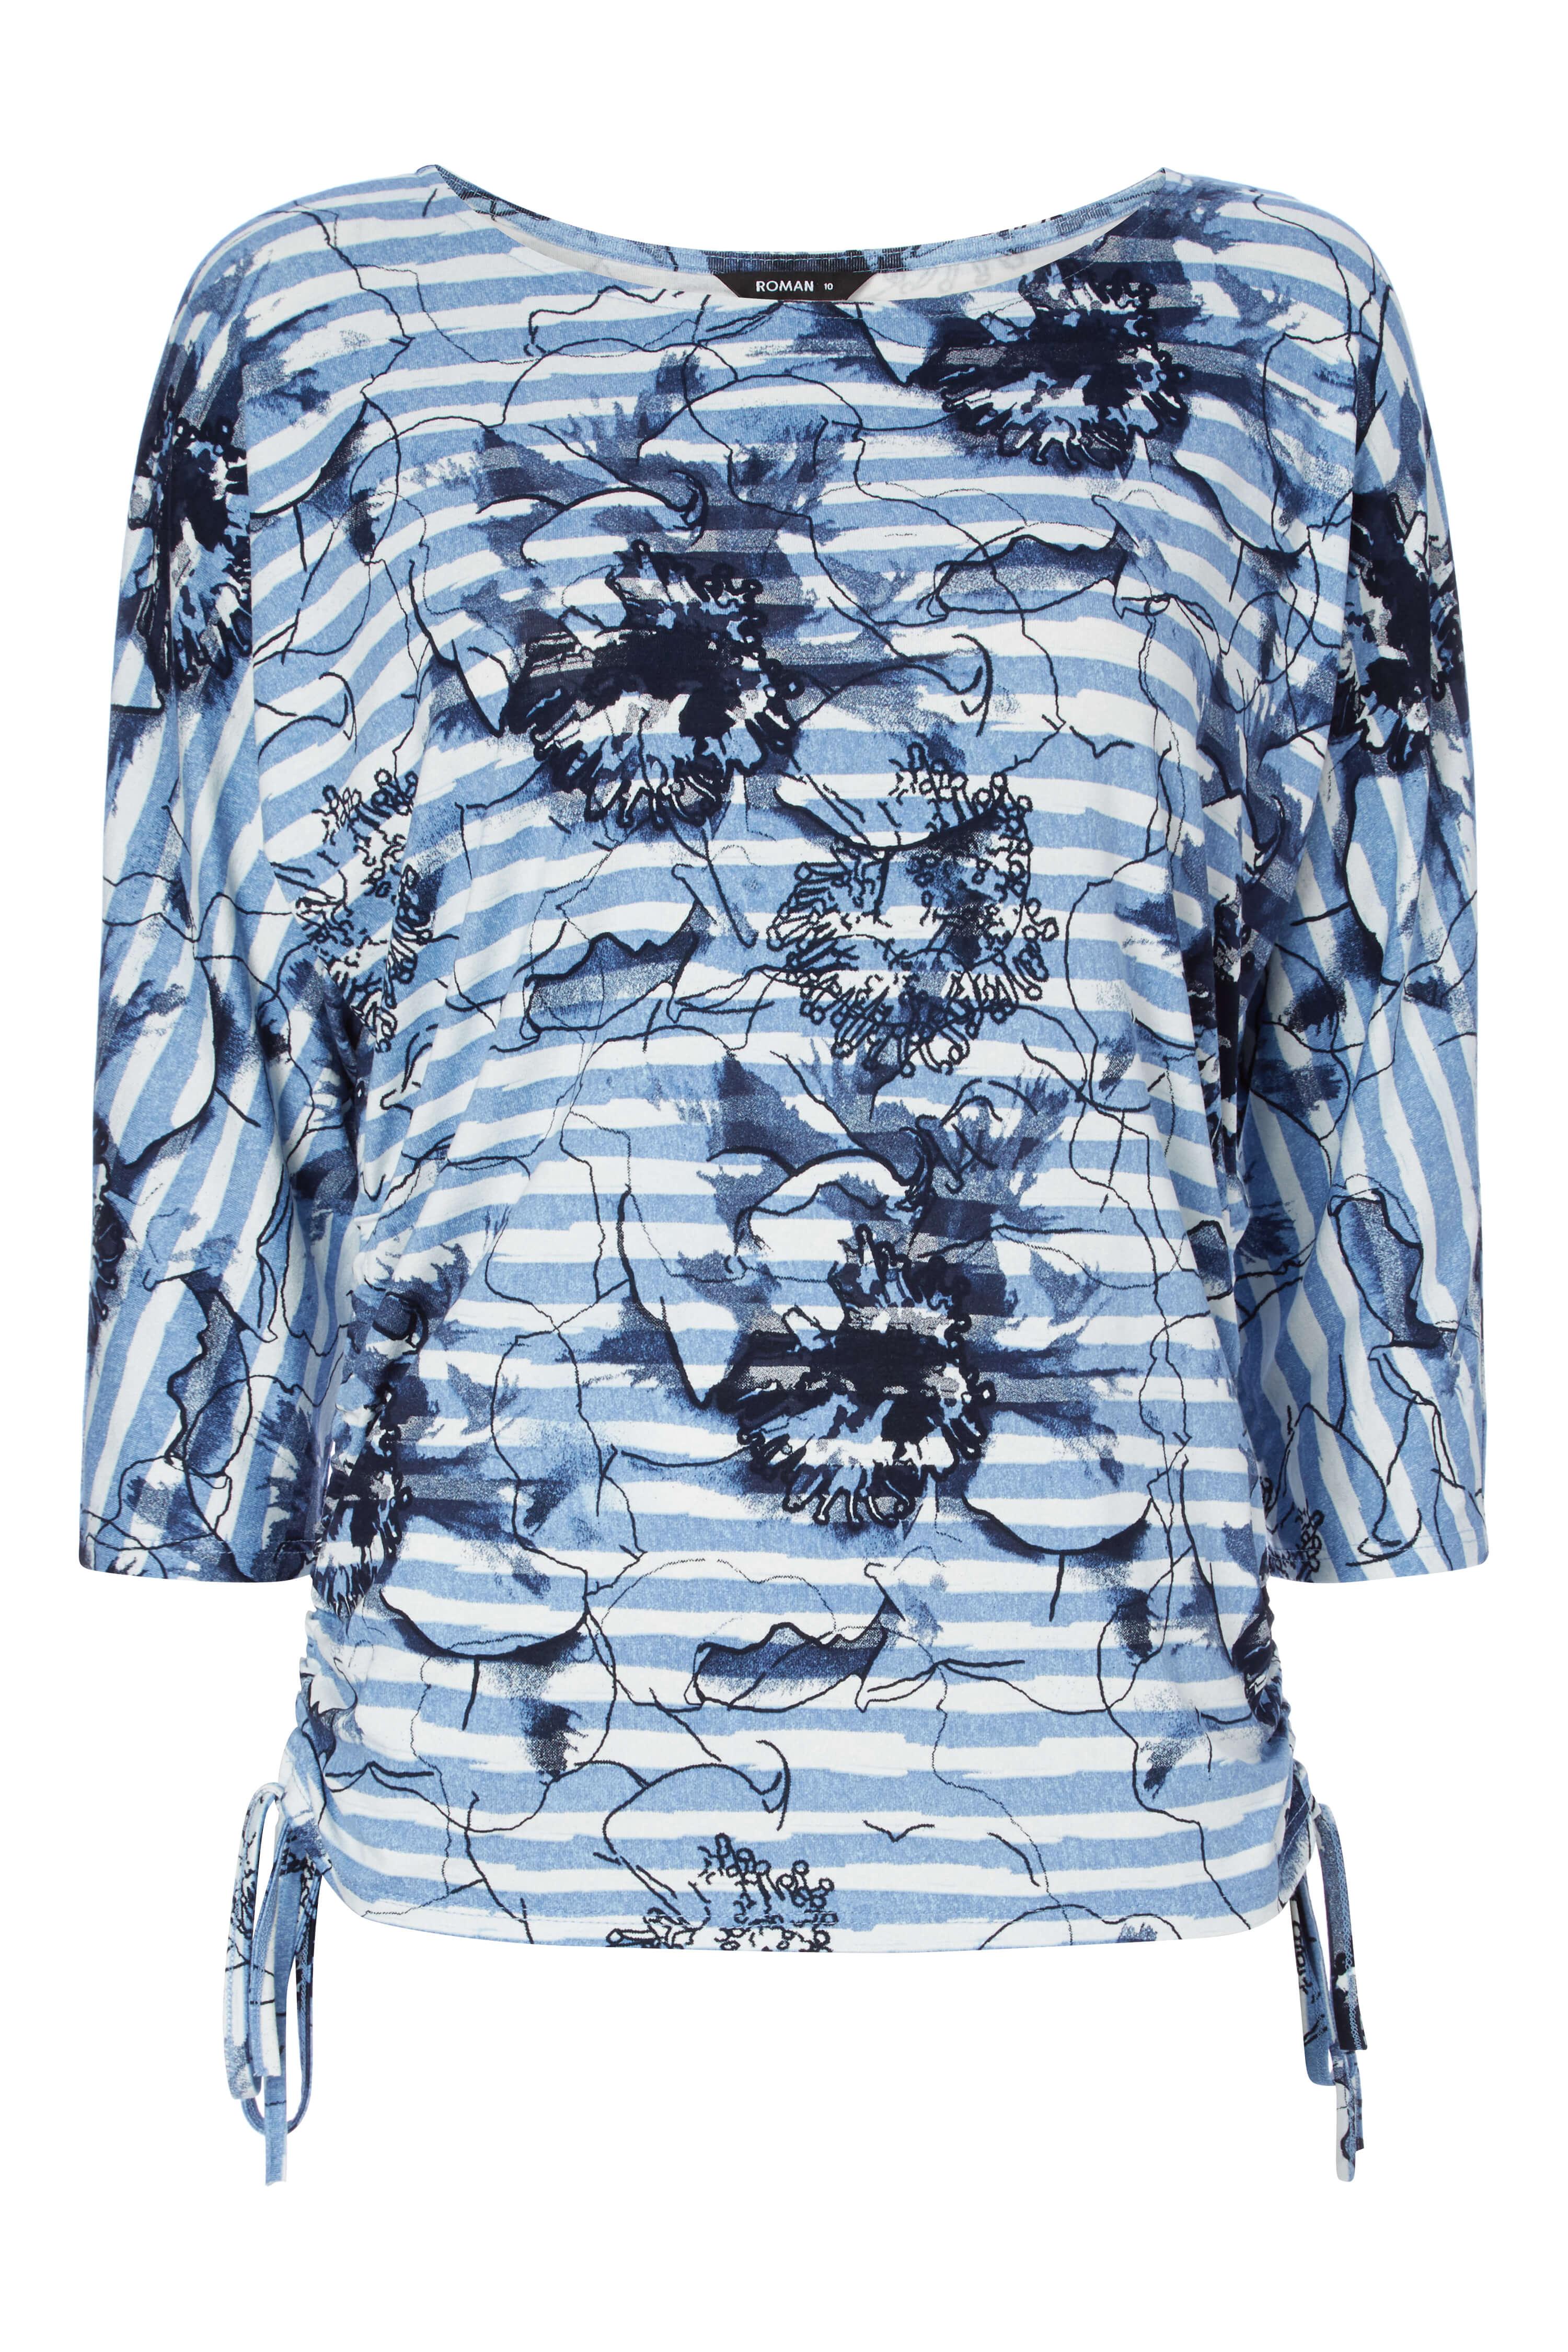 Roman Originals Femme Motif Floral Bleu à Rayures Imprimé Neuf Tailles 10-20